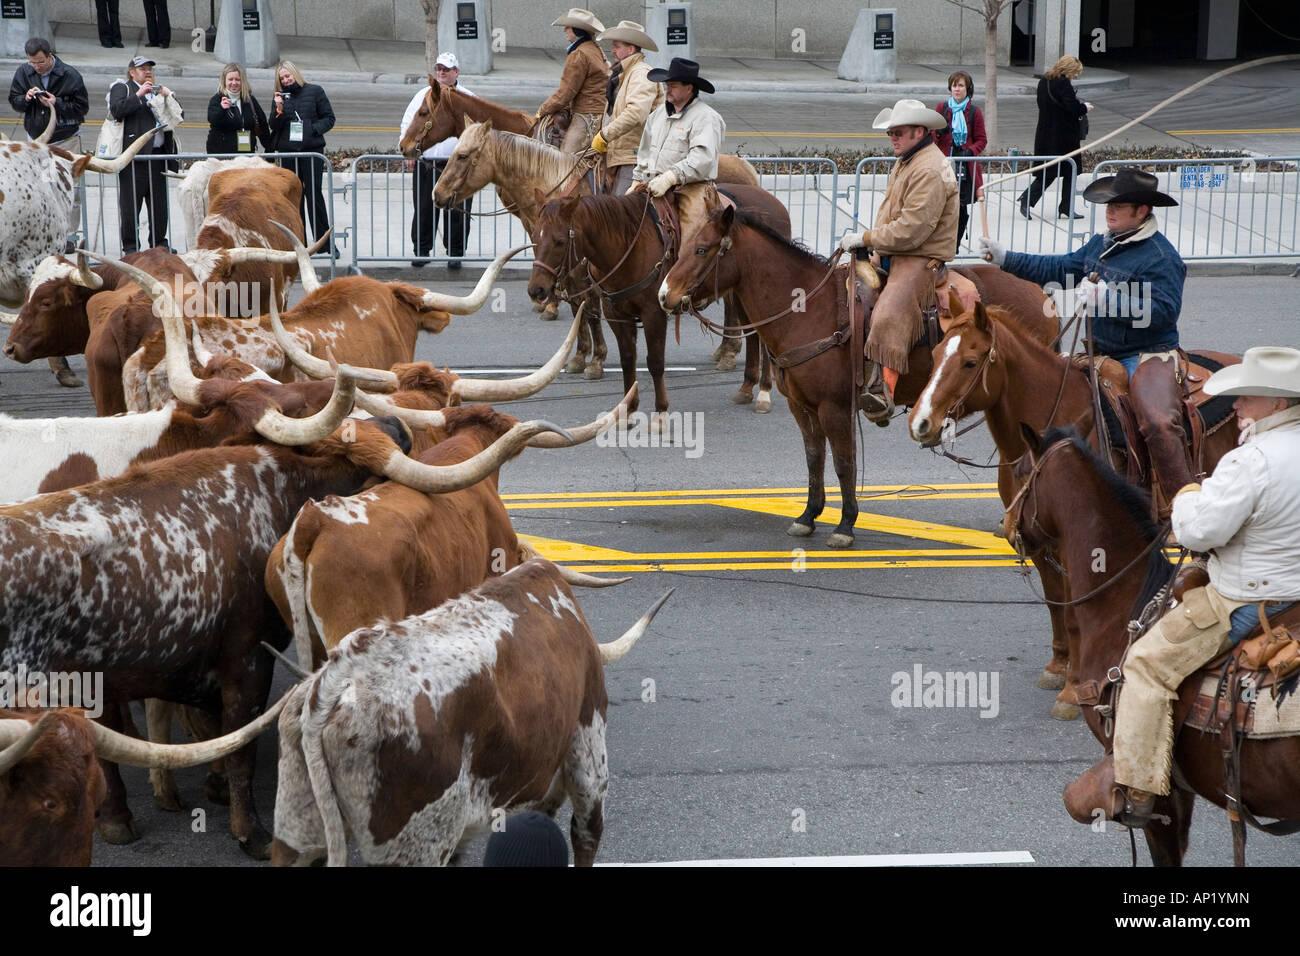 Cowboys Roundup Cattle Stockfotos & Cowboys Roundup Cattle Bilder ...